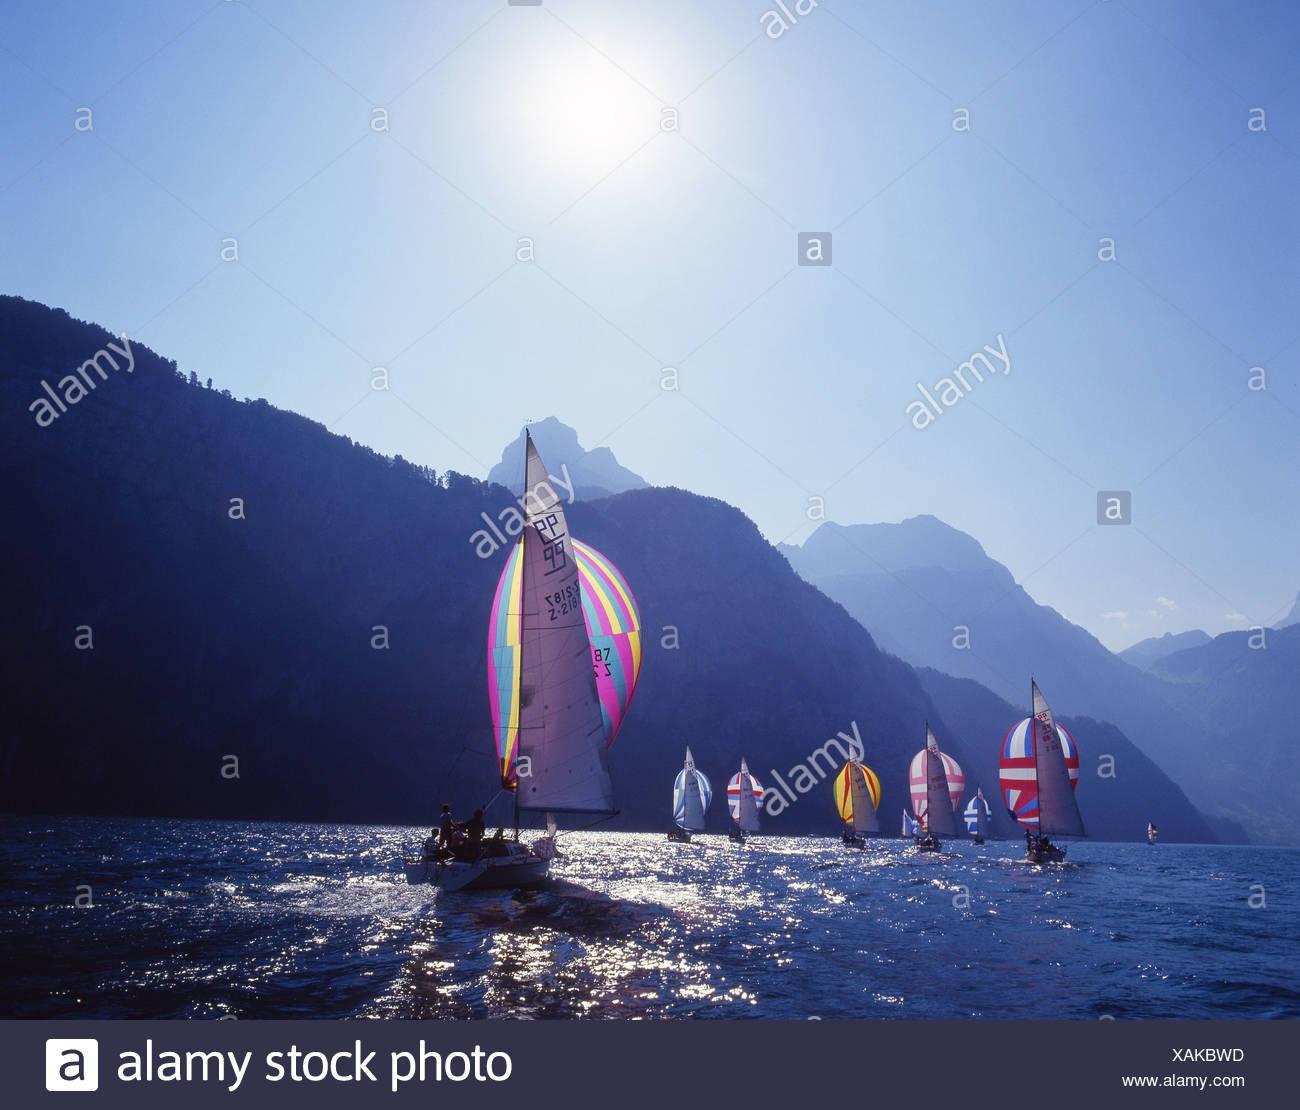 sailing regatta Urnersee yachting regatta Lake Lucerne water lake Central Switzerland Europe Central Switzerl - Stock Image